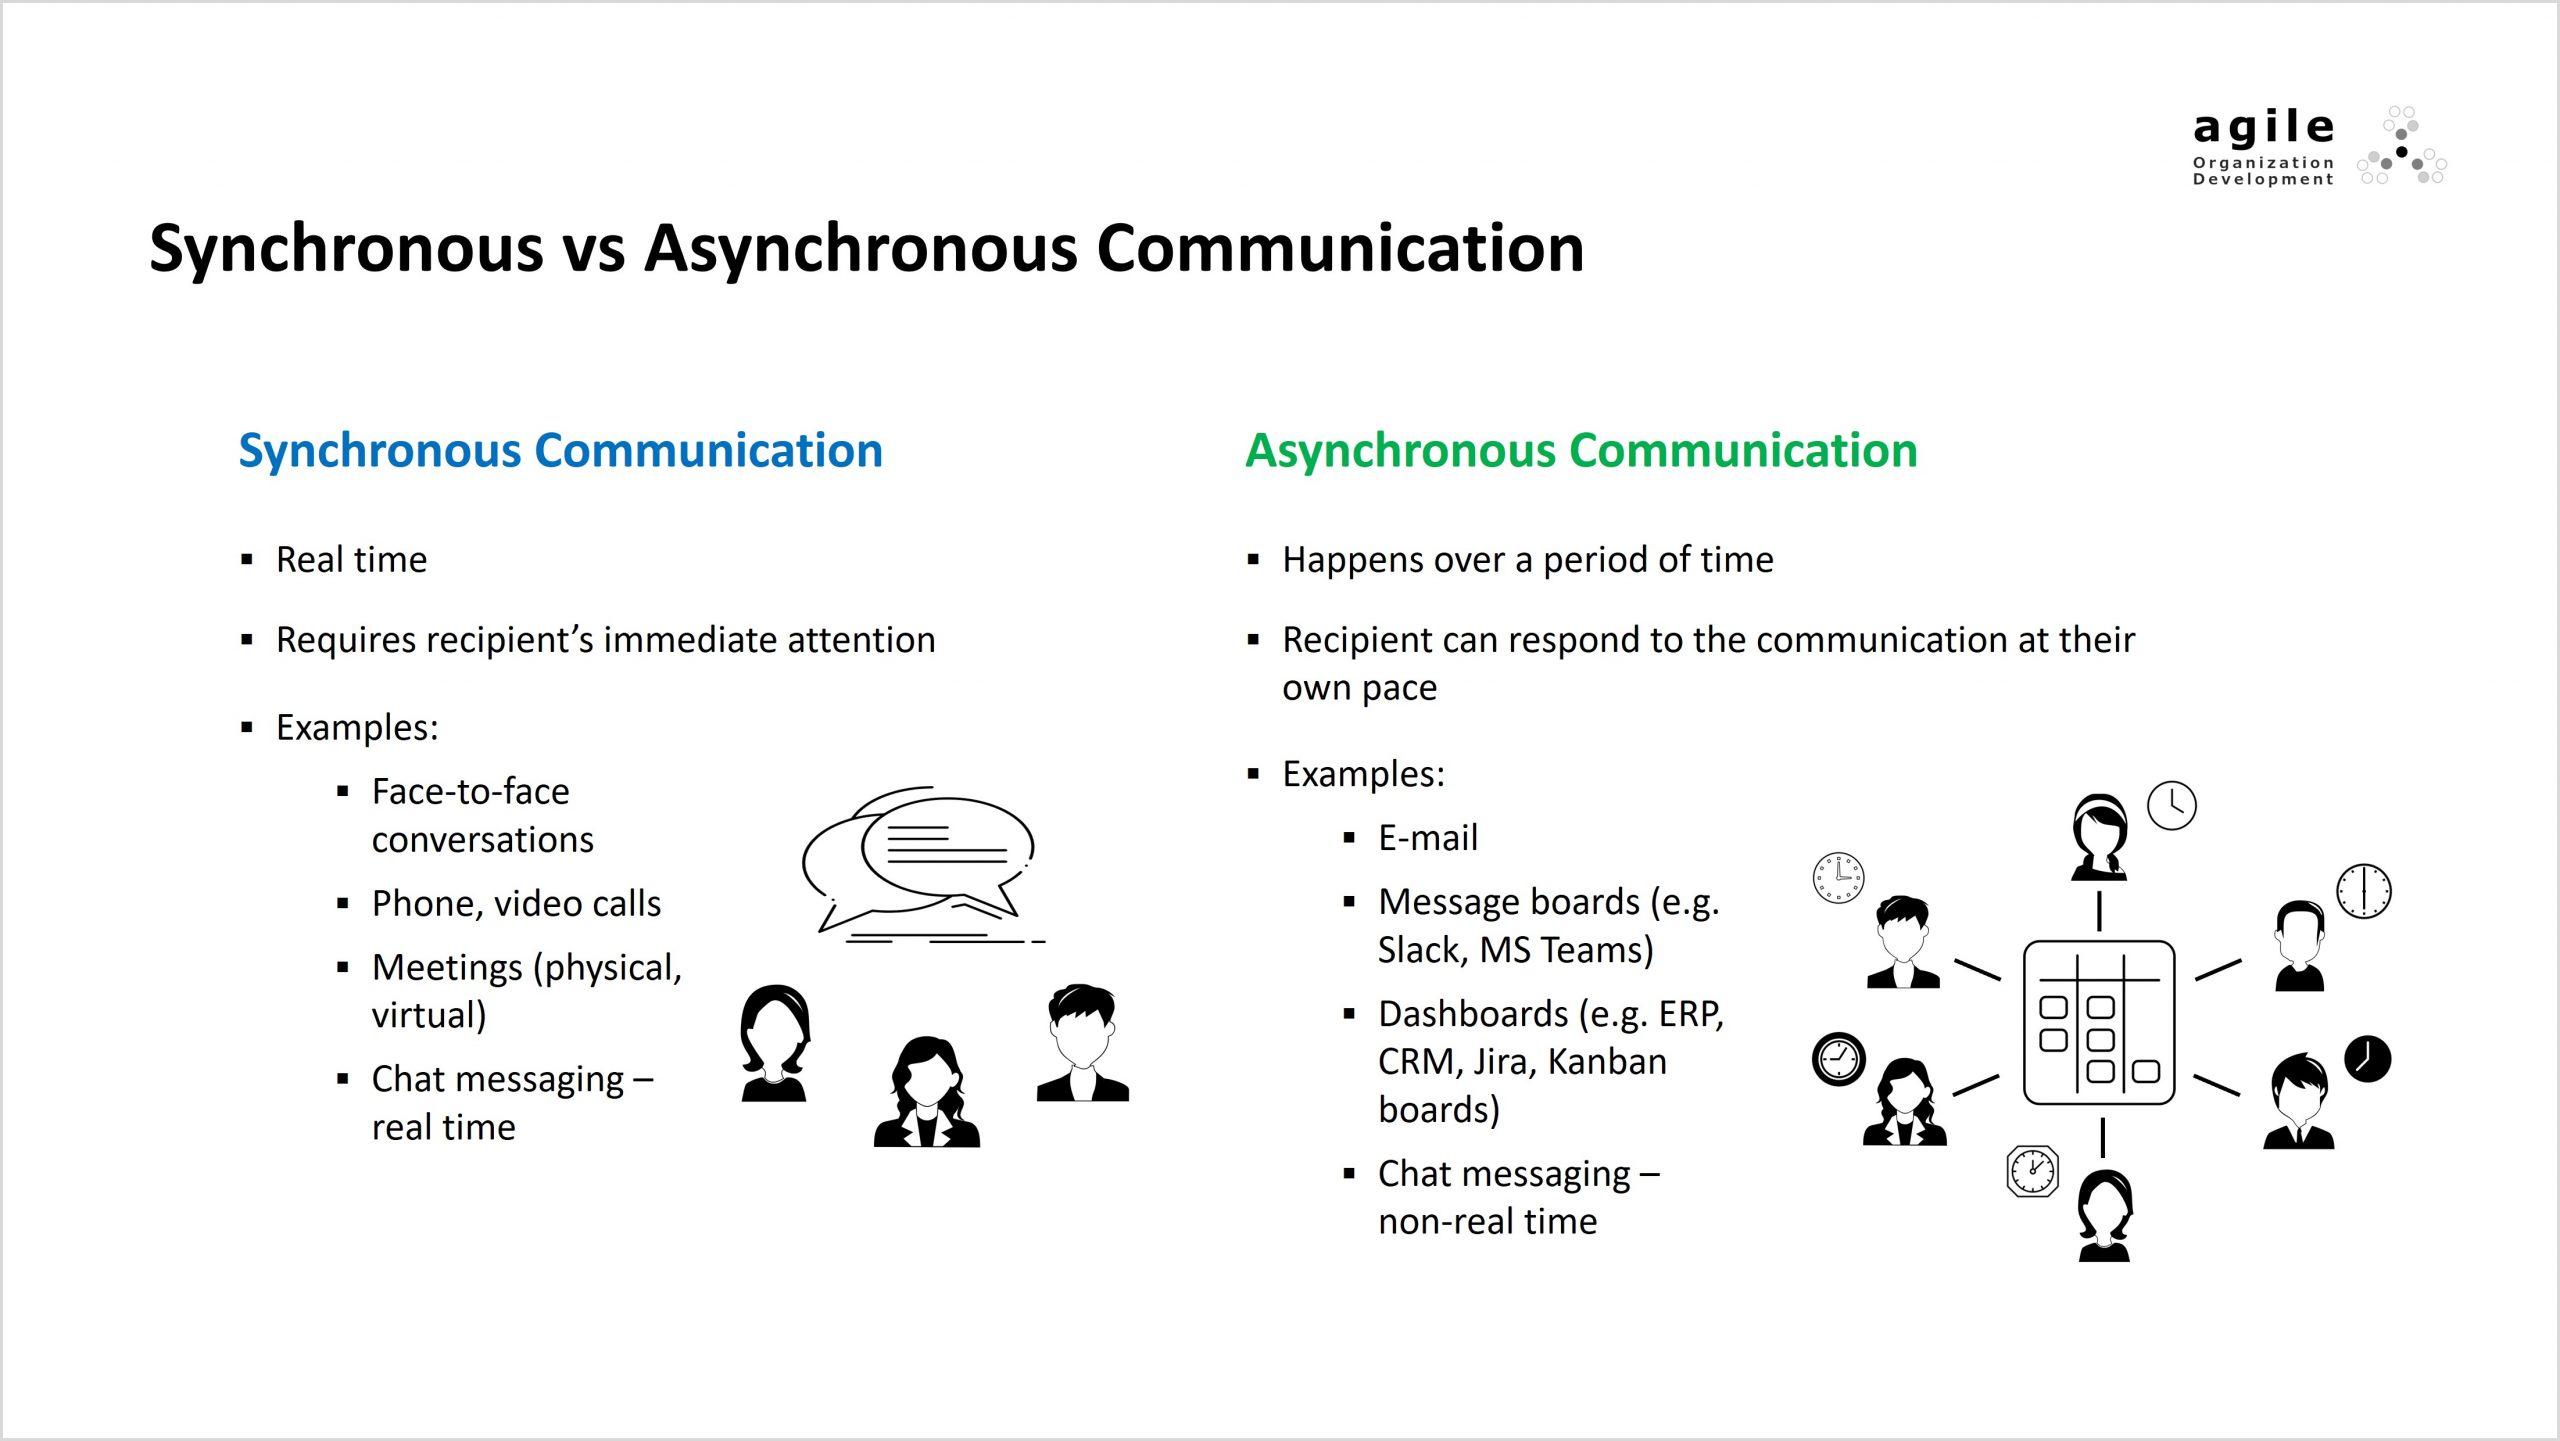 Synchronous VS Asynchronous Communication